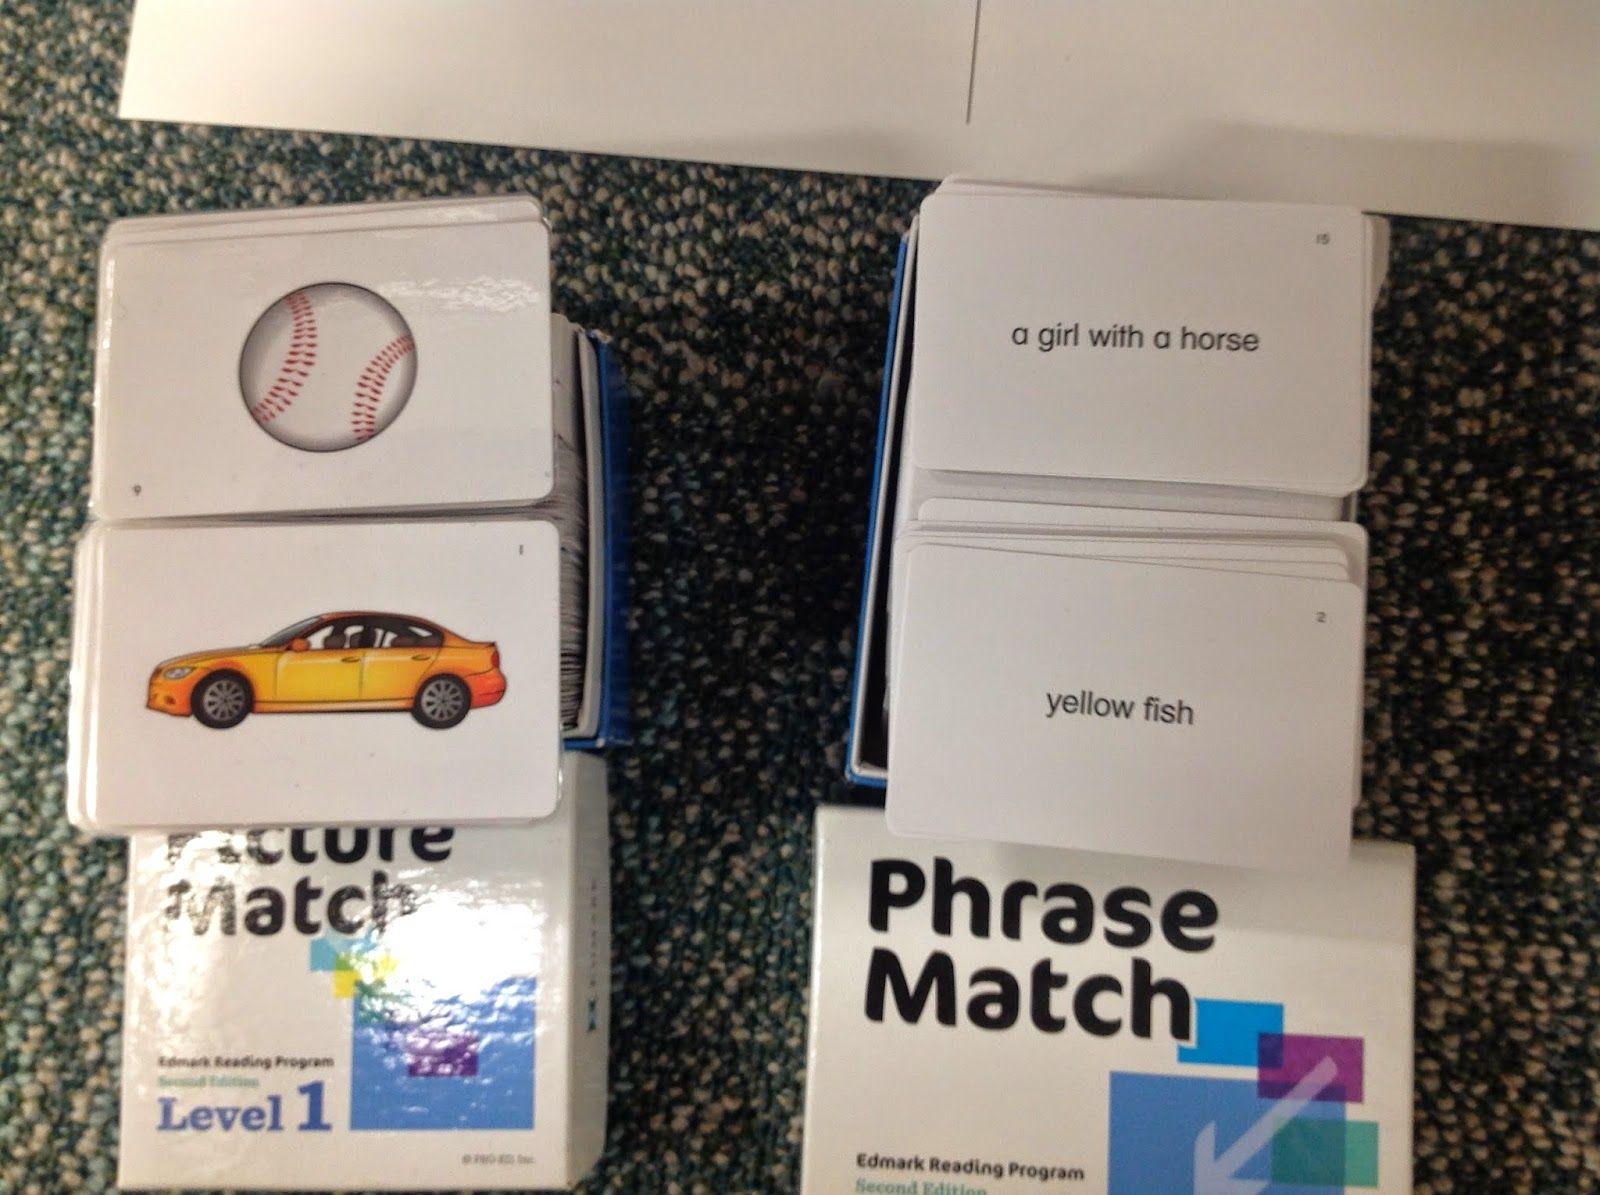 worksheet Free Edmark Reading Program Worksheets teach love autism edmark reading program in an classroom classroom